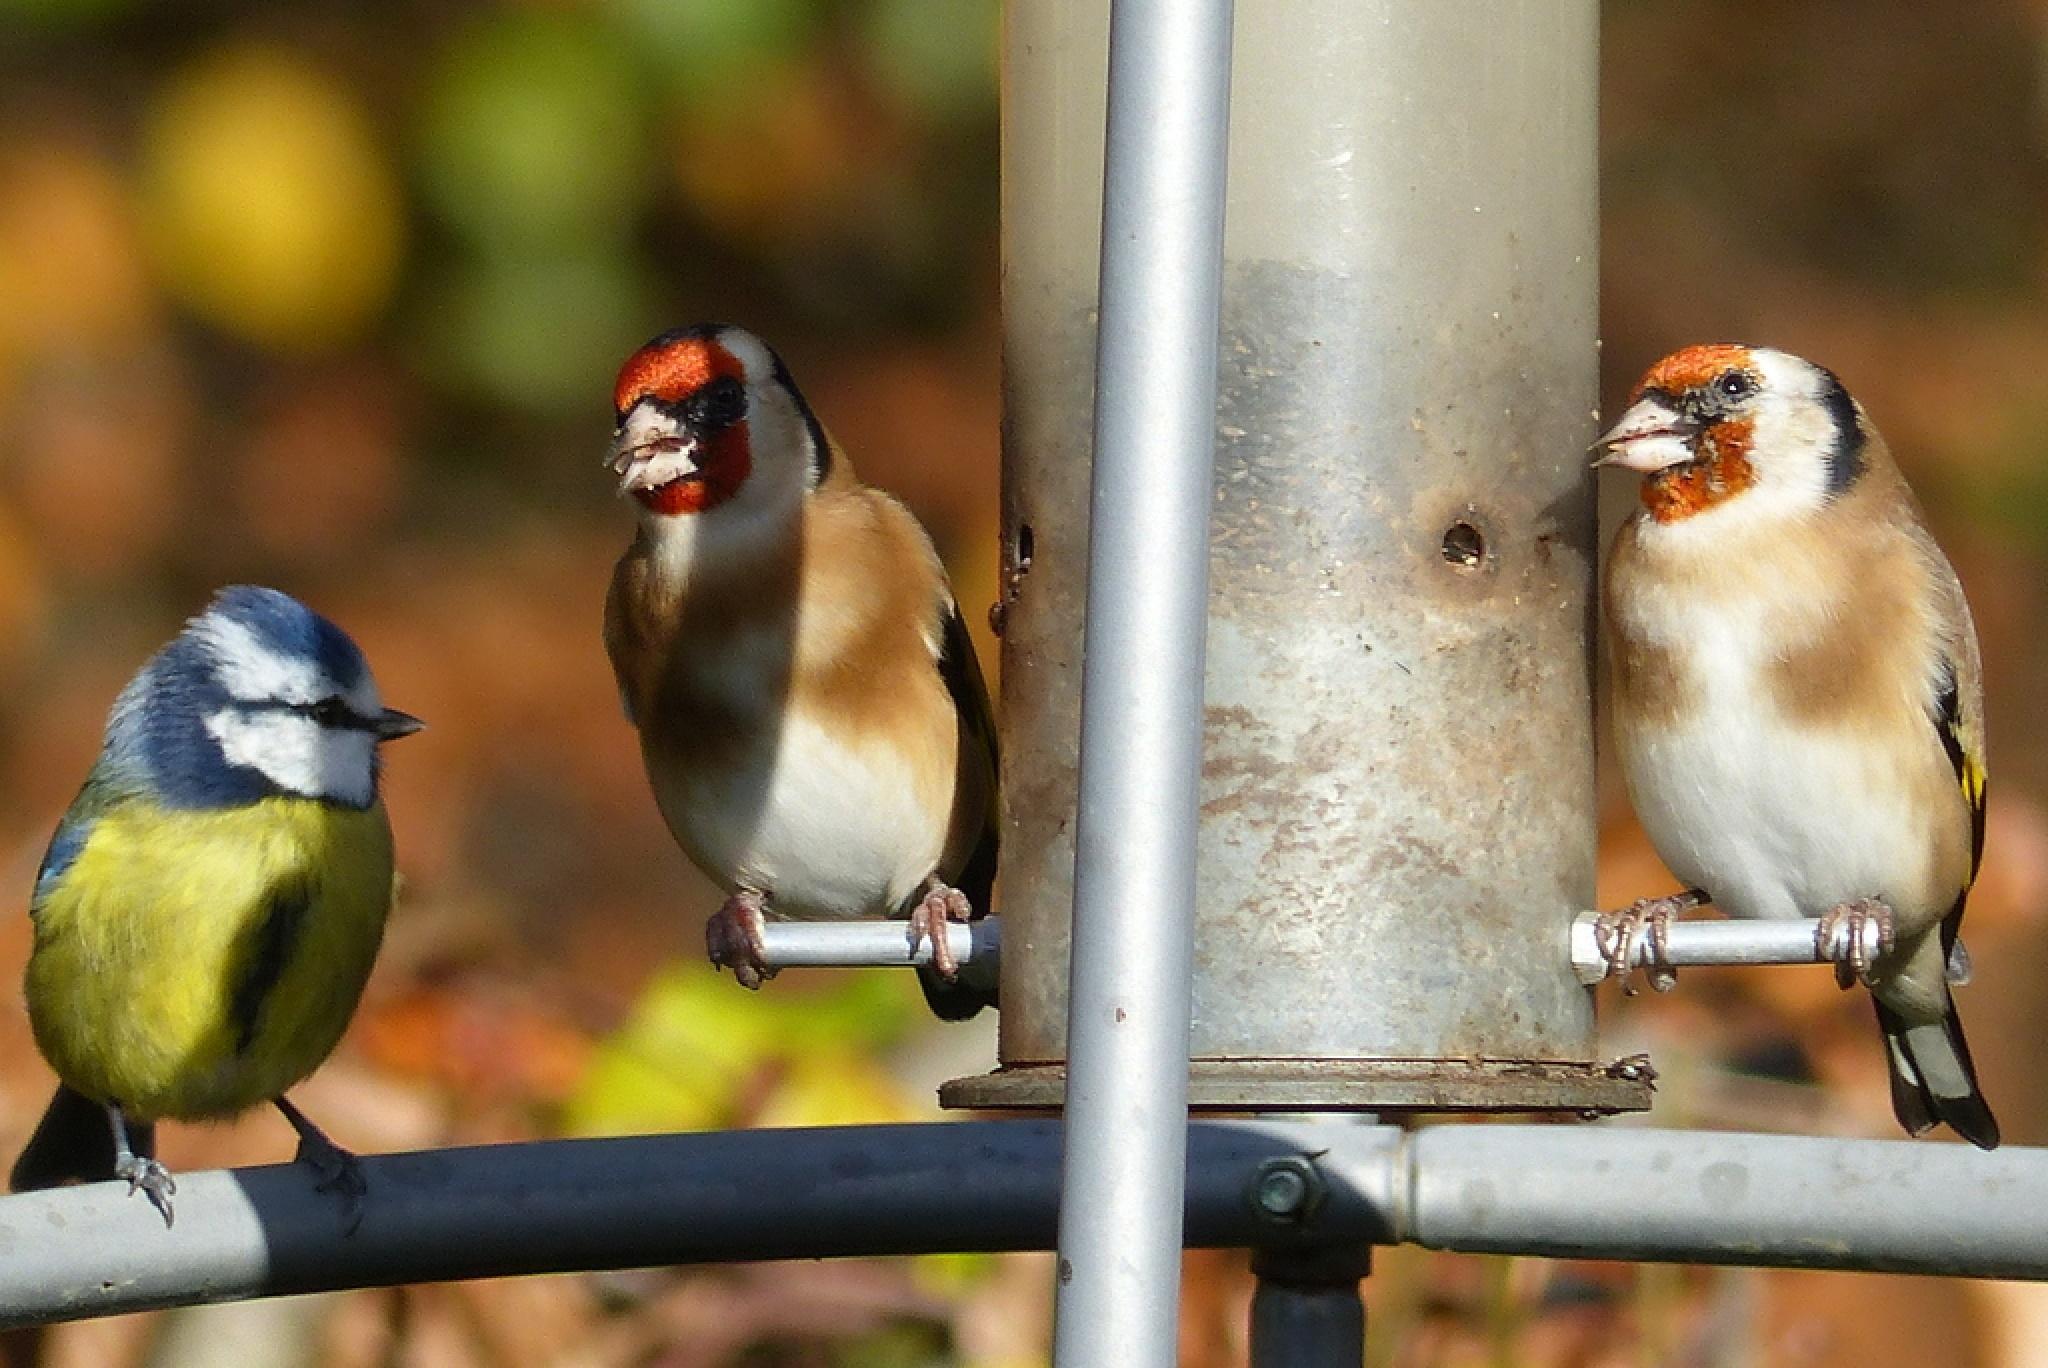 Wait your turn Shorty ! #BlueTit #Goldfinch by Malc Thomason